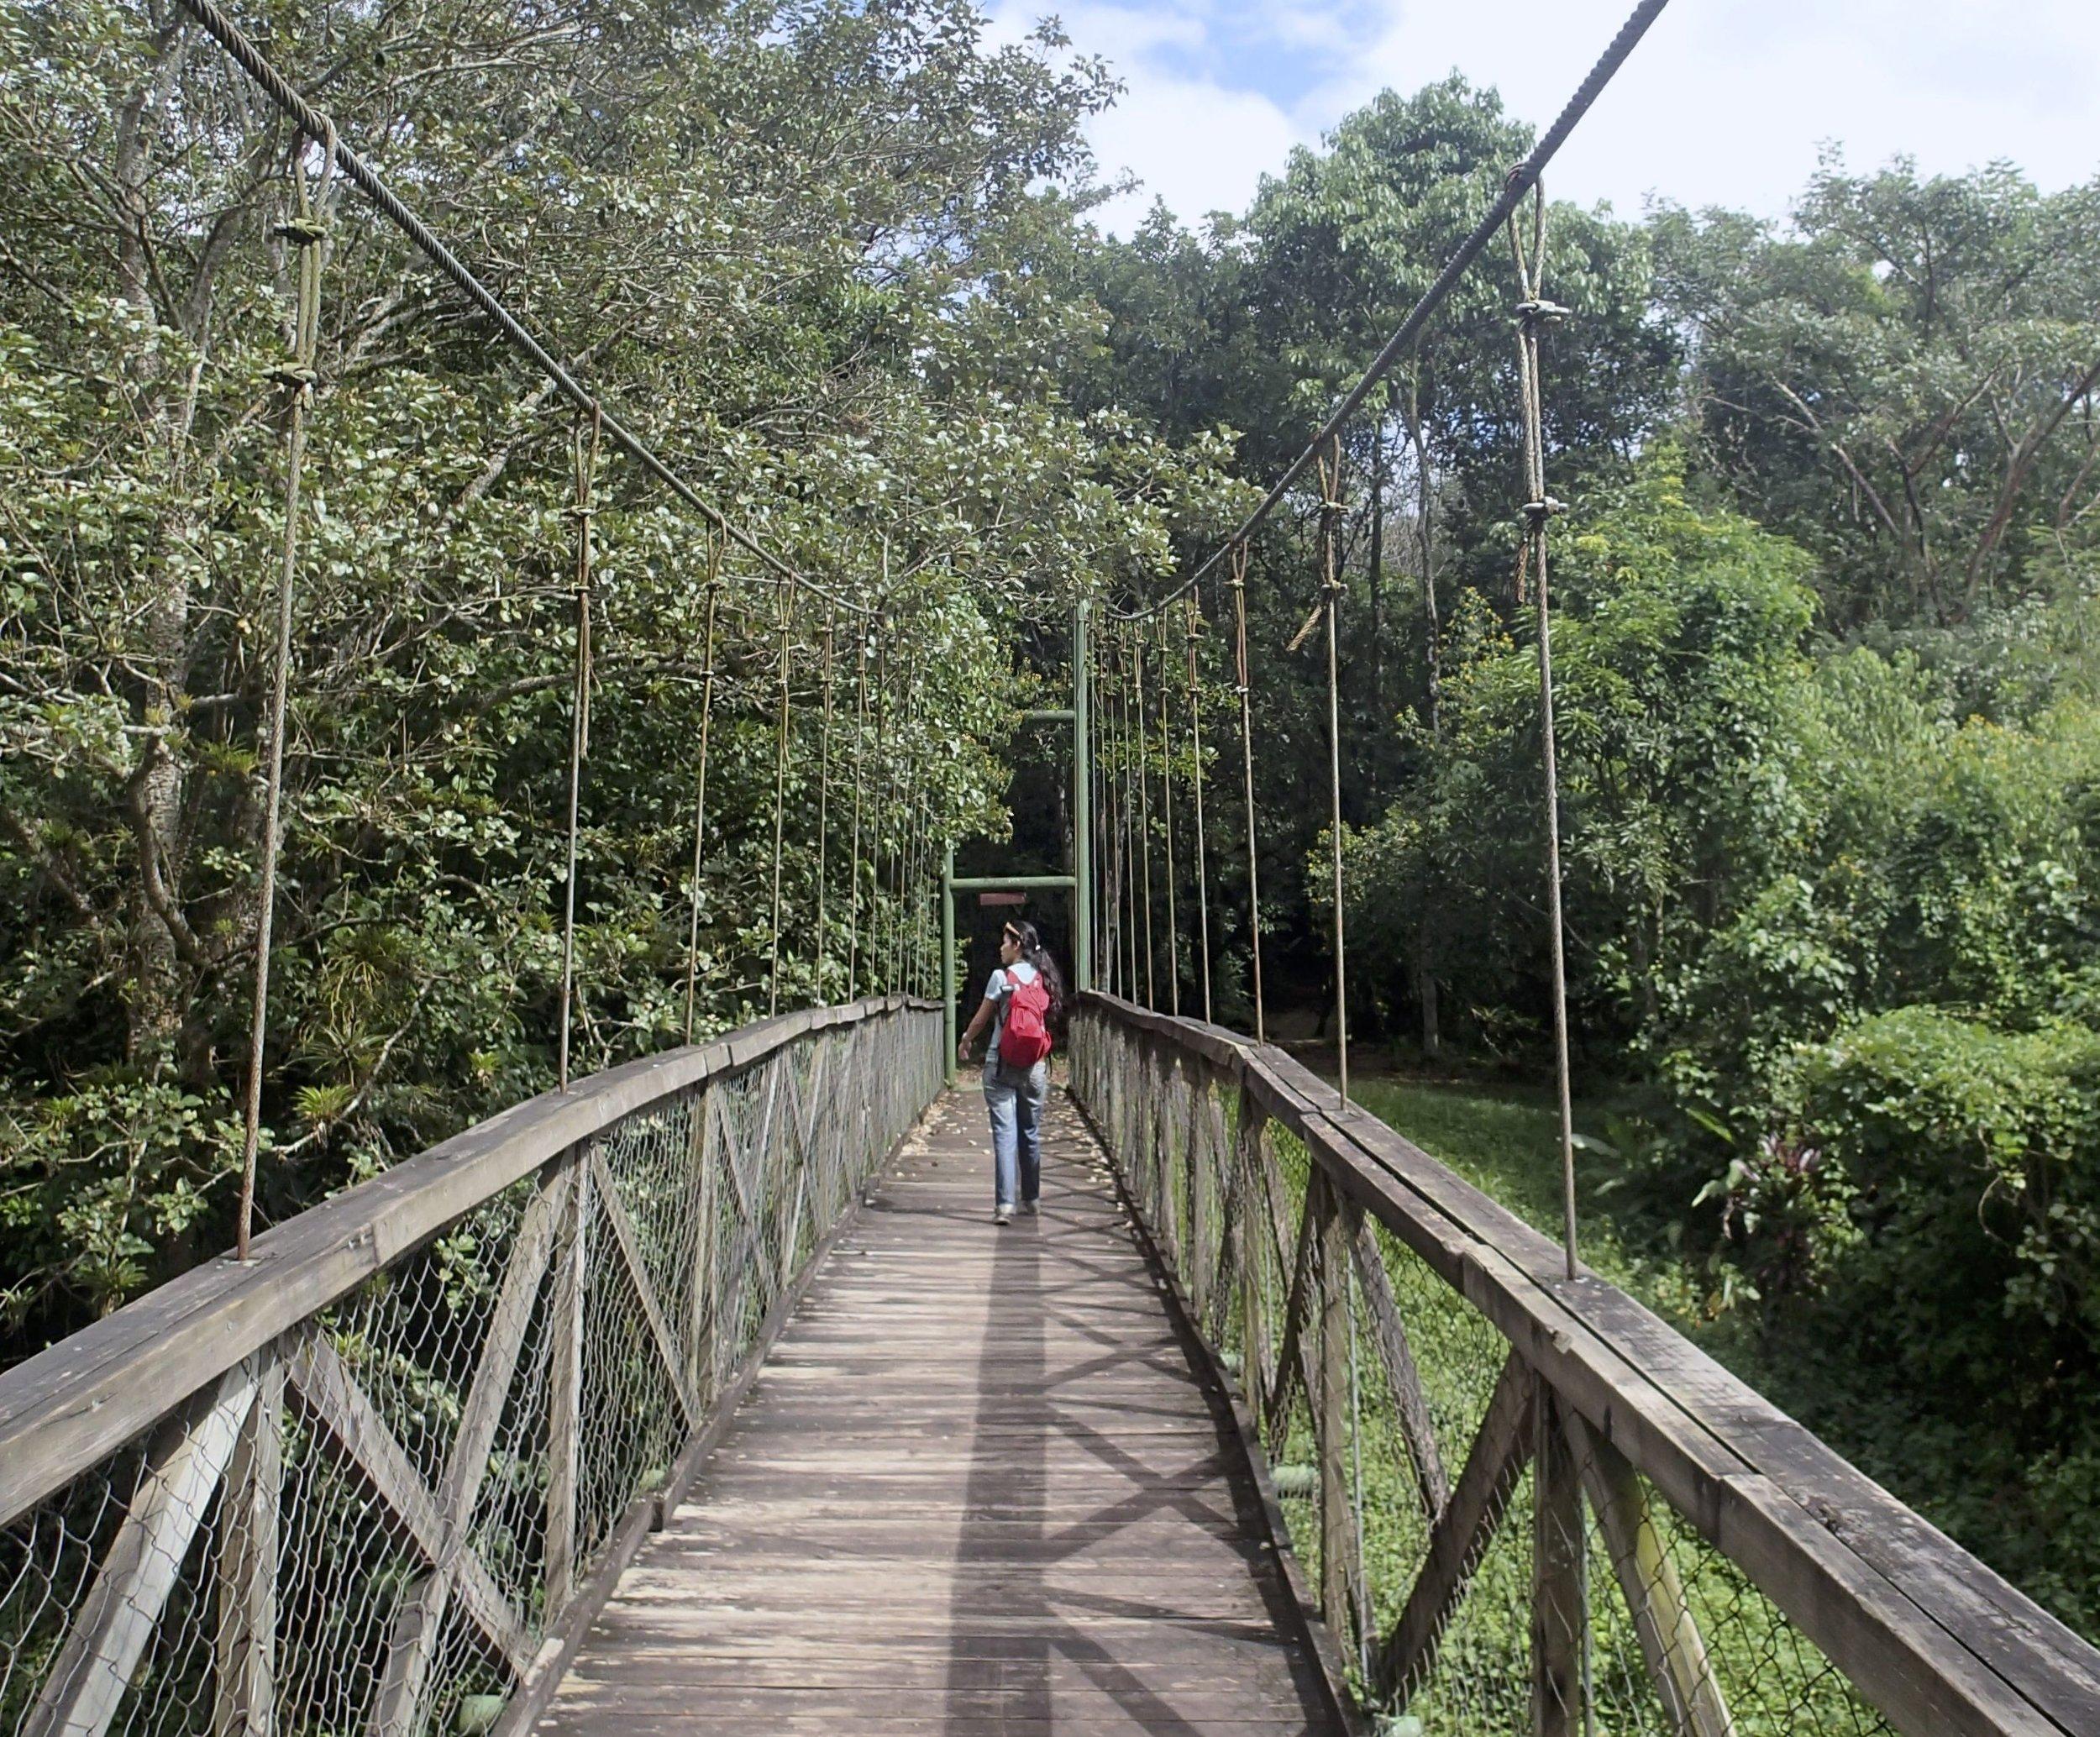 Pei-Ciao on suspension bridge 12-20-13.jpg